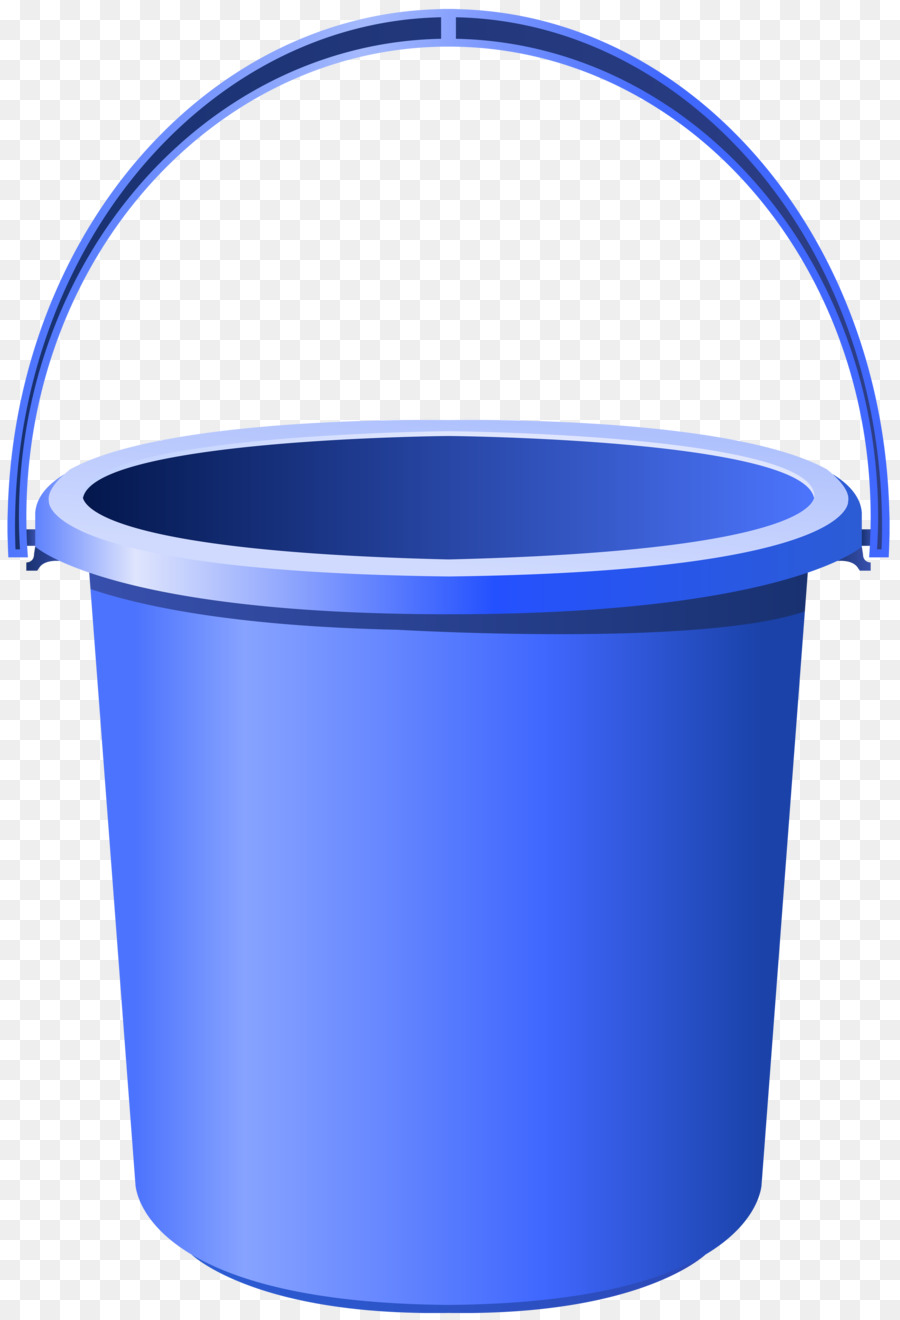 Bucket clipart container. Cobalt blue plastic